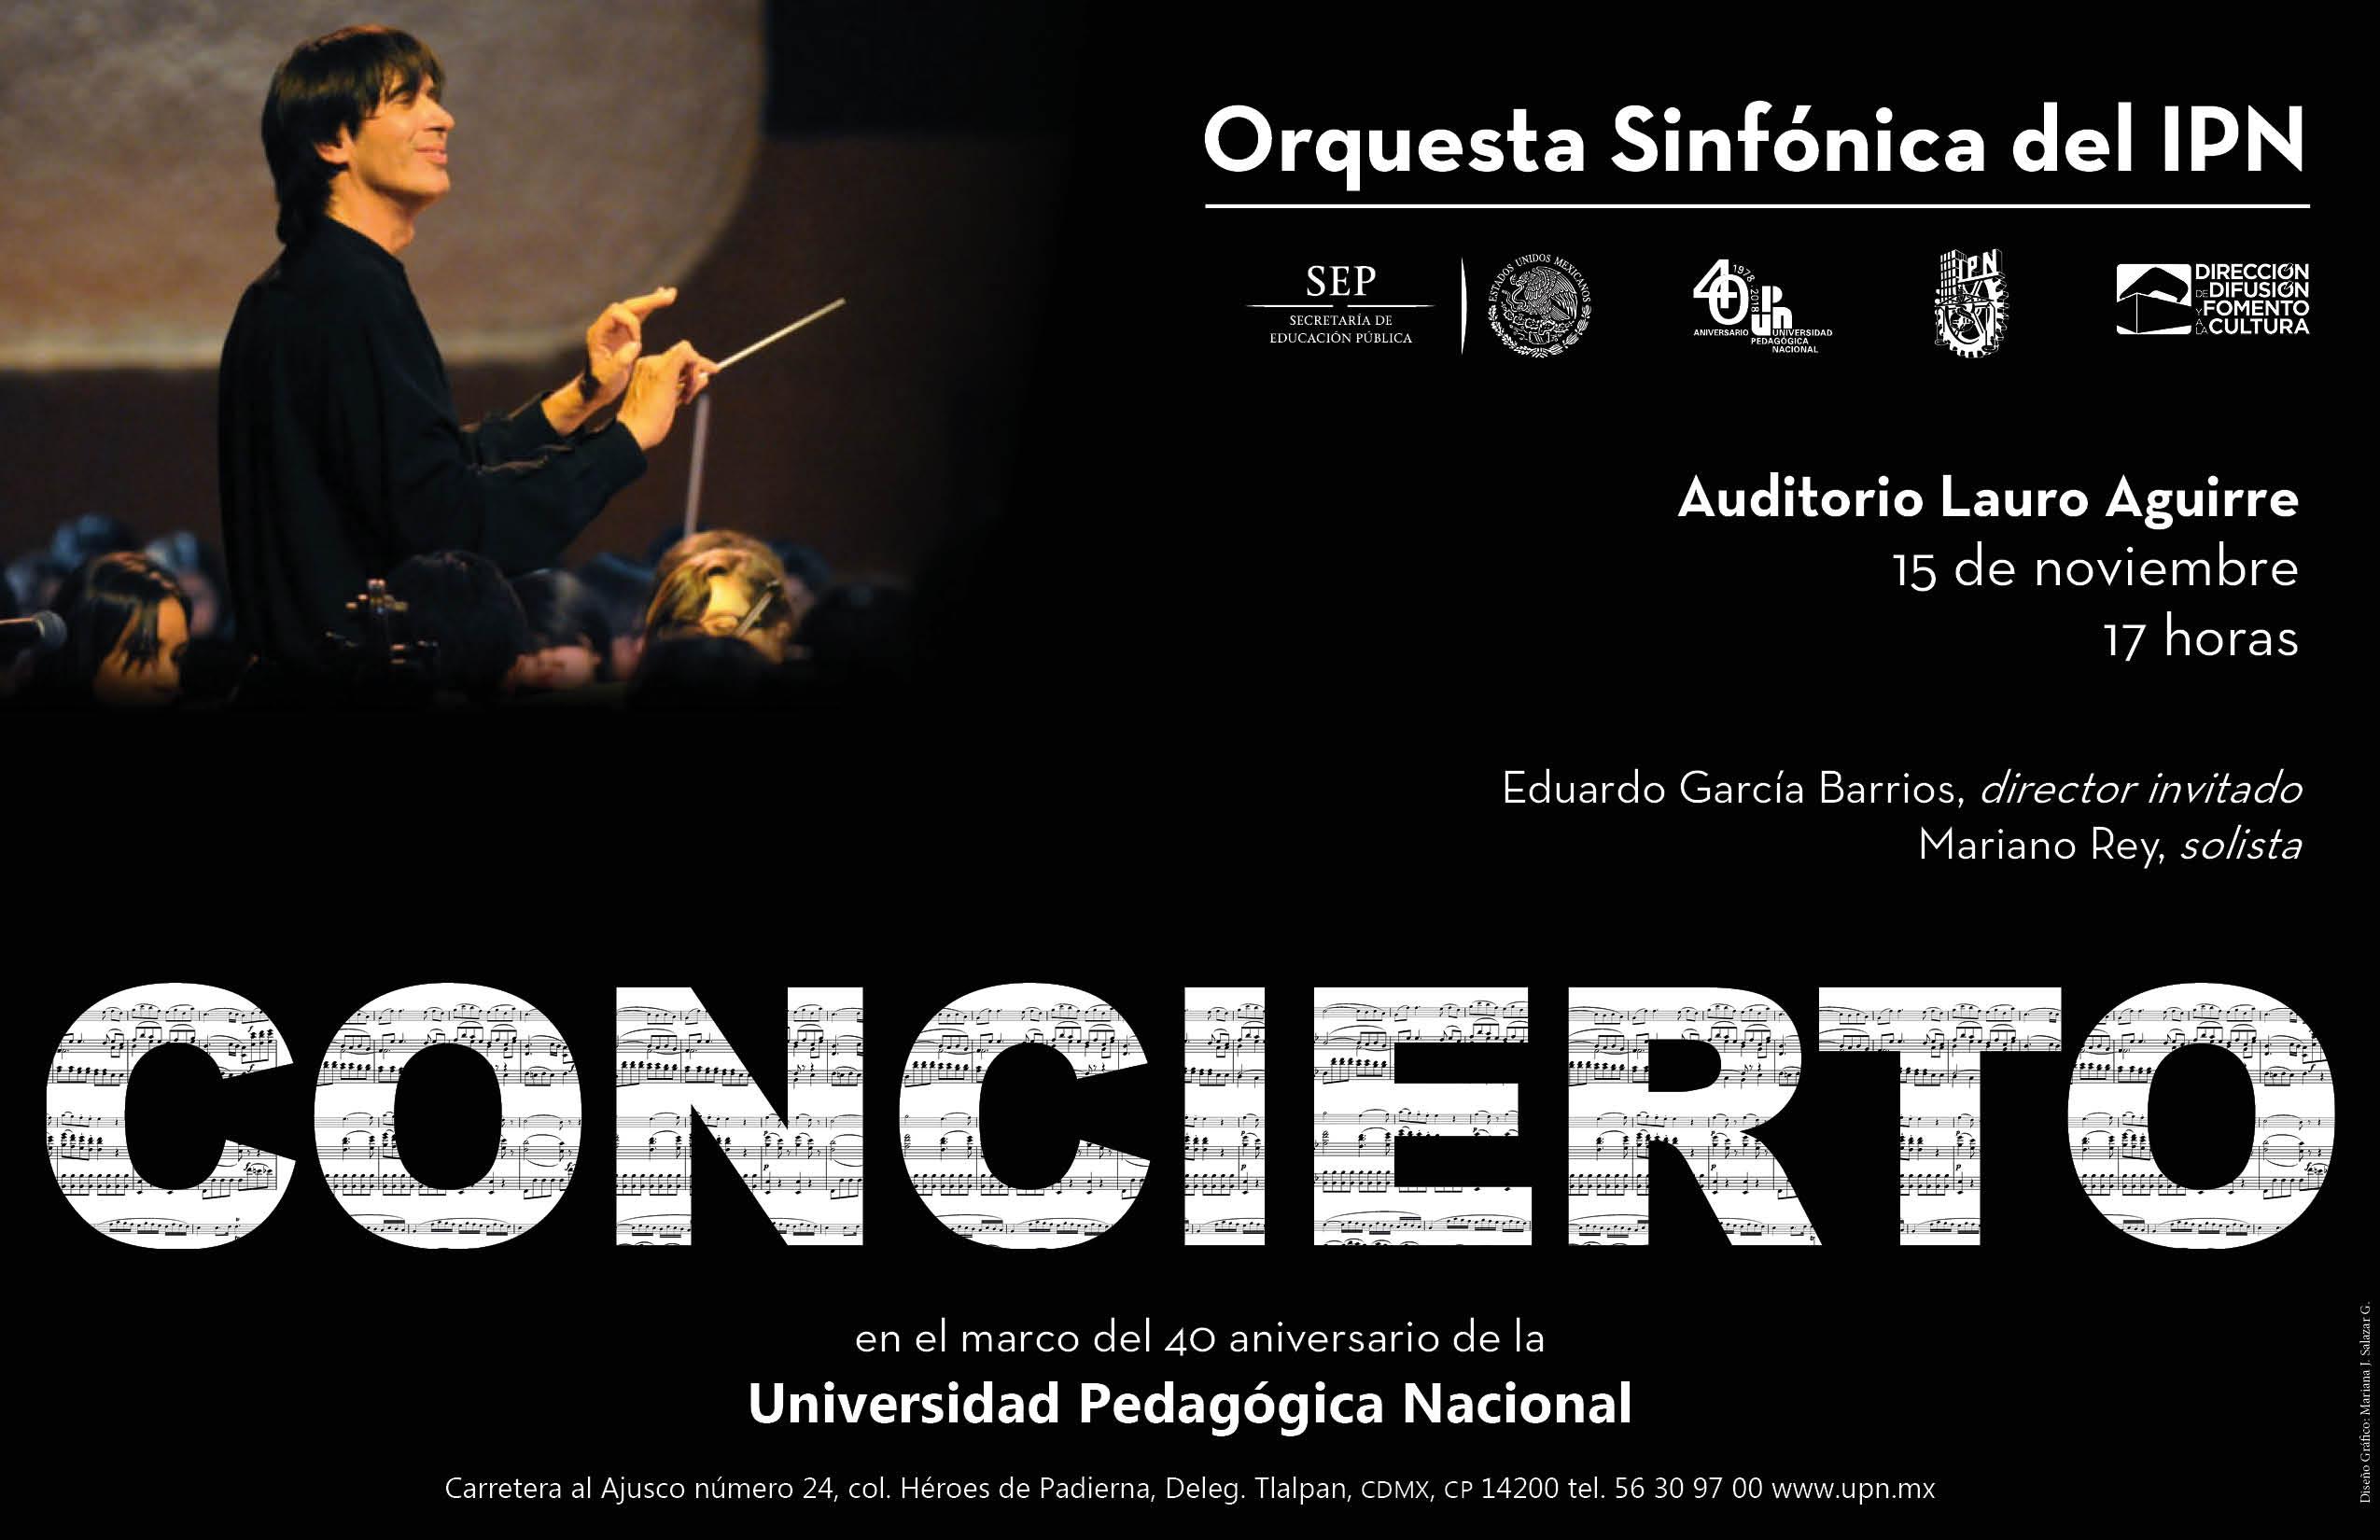 Orquesta ipn 2da propuesta